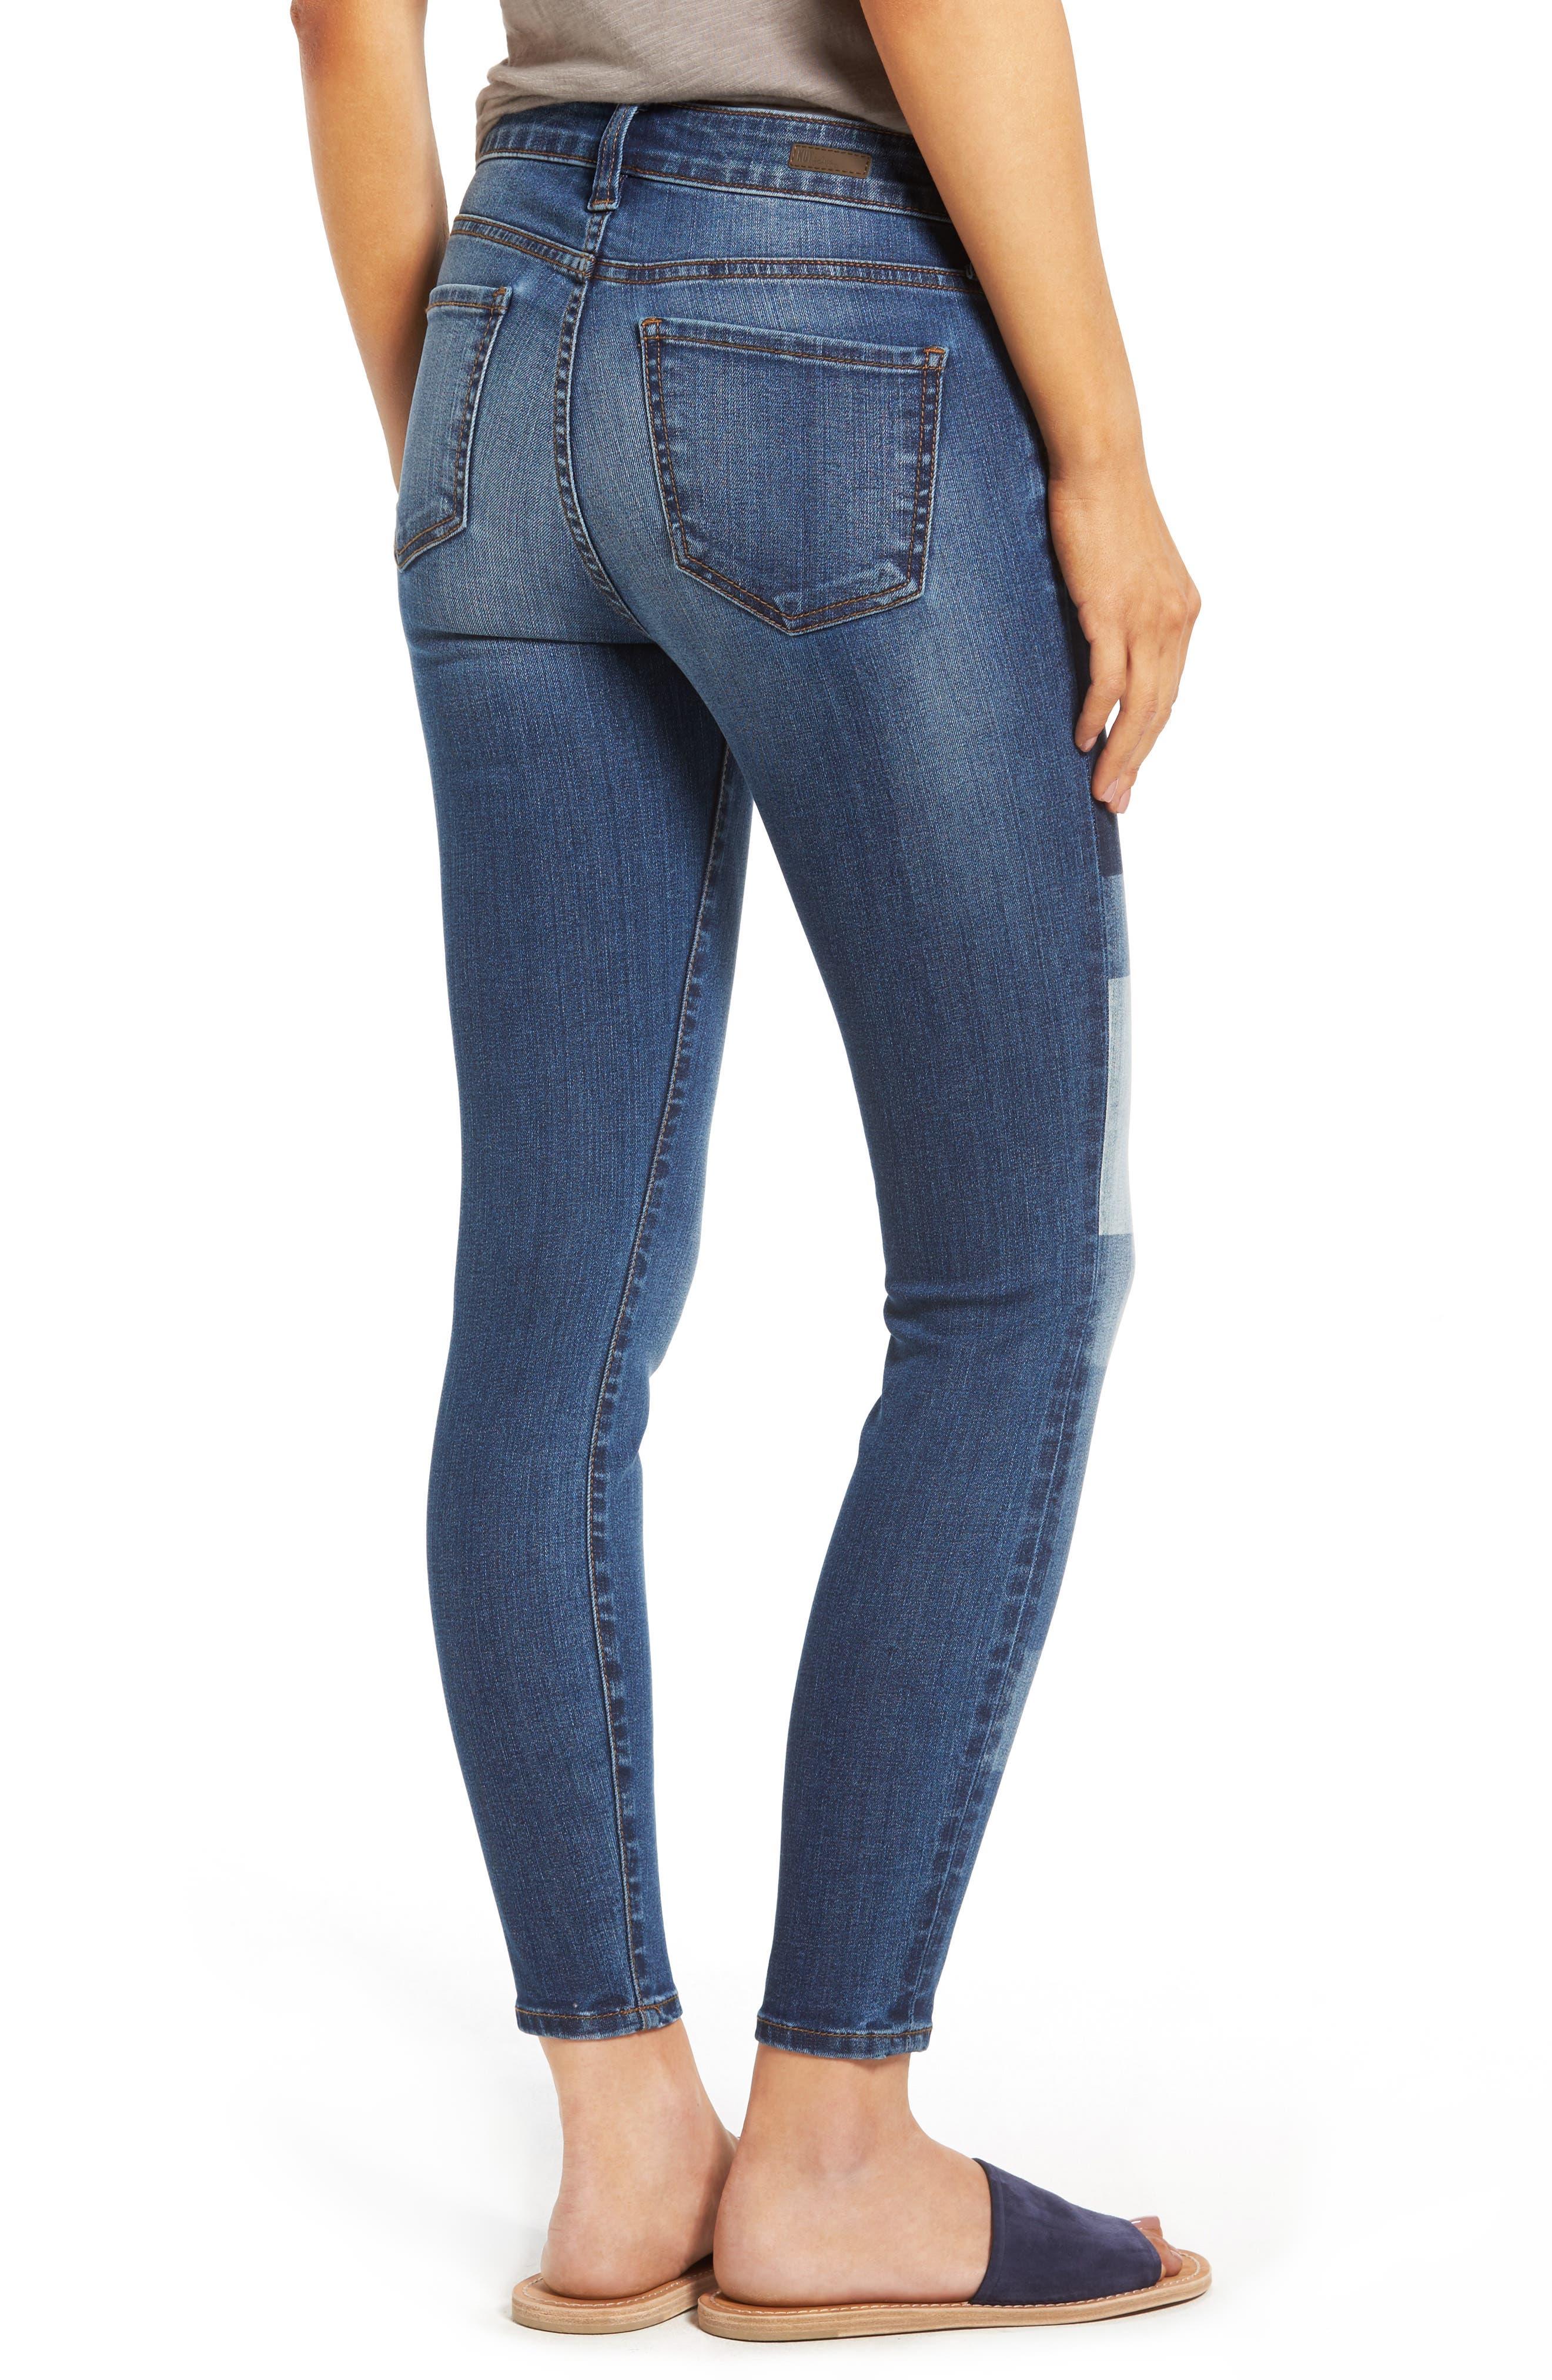 Patchwork Fade Skinny Jeans,                             Alternate thumbnail 2, color,                             Coequal / Dark Stone